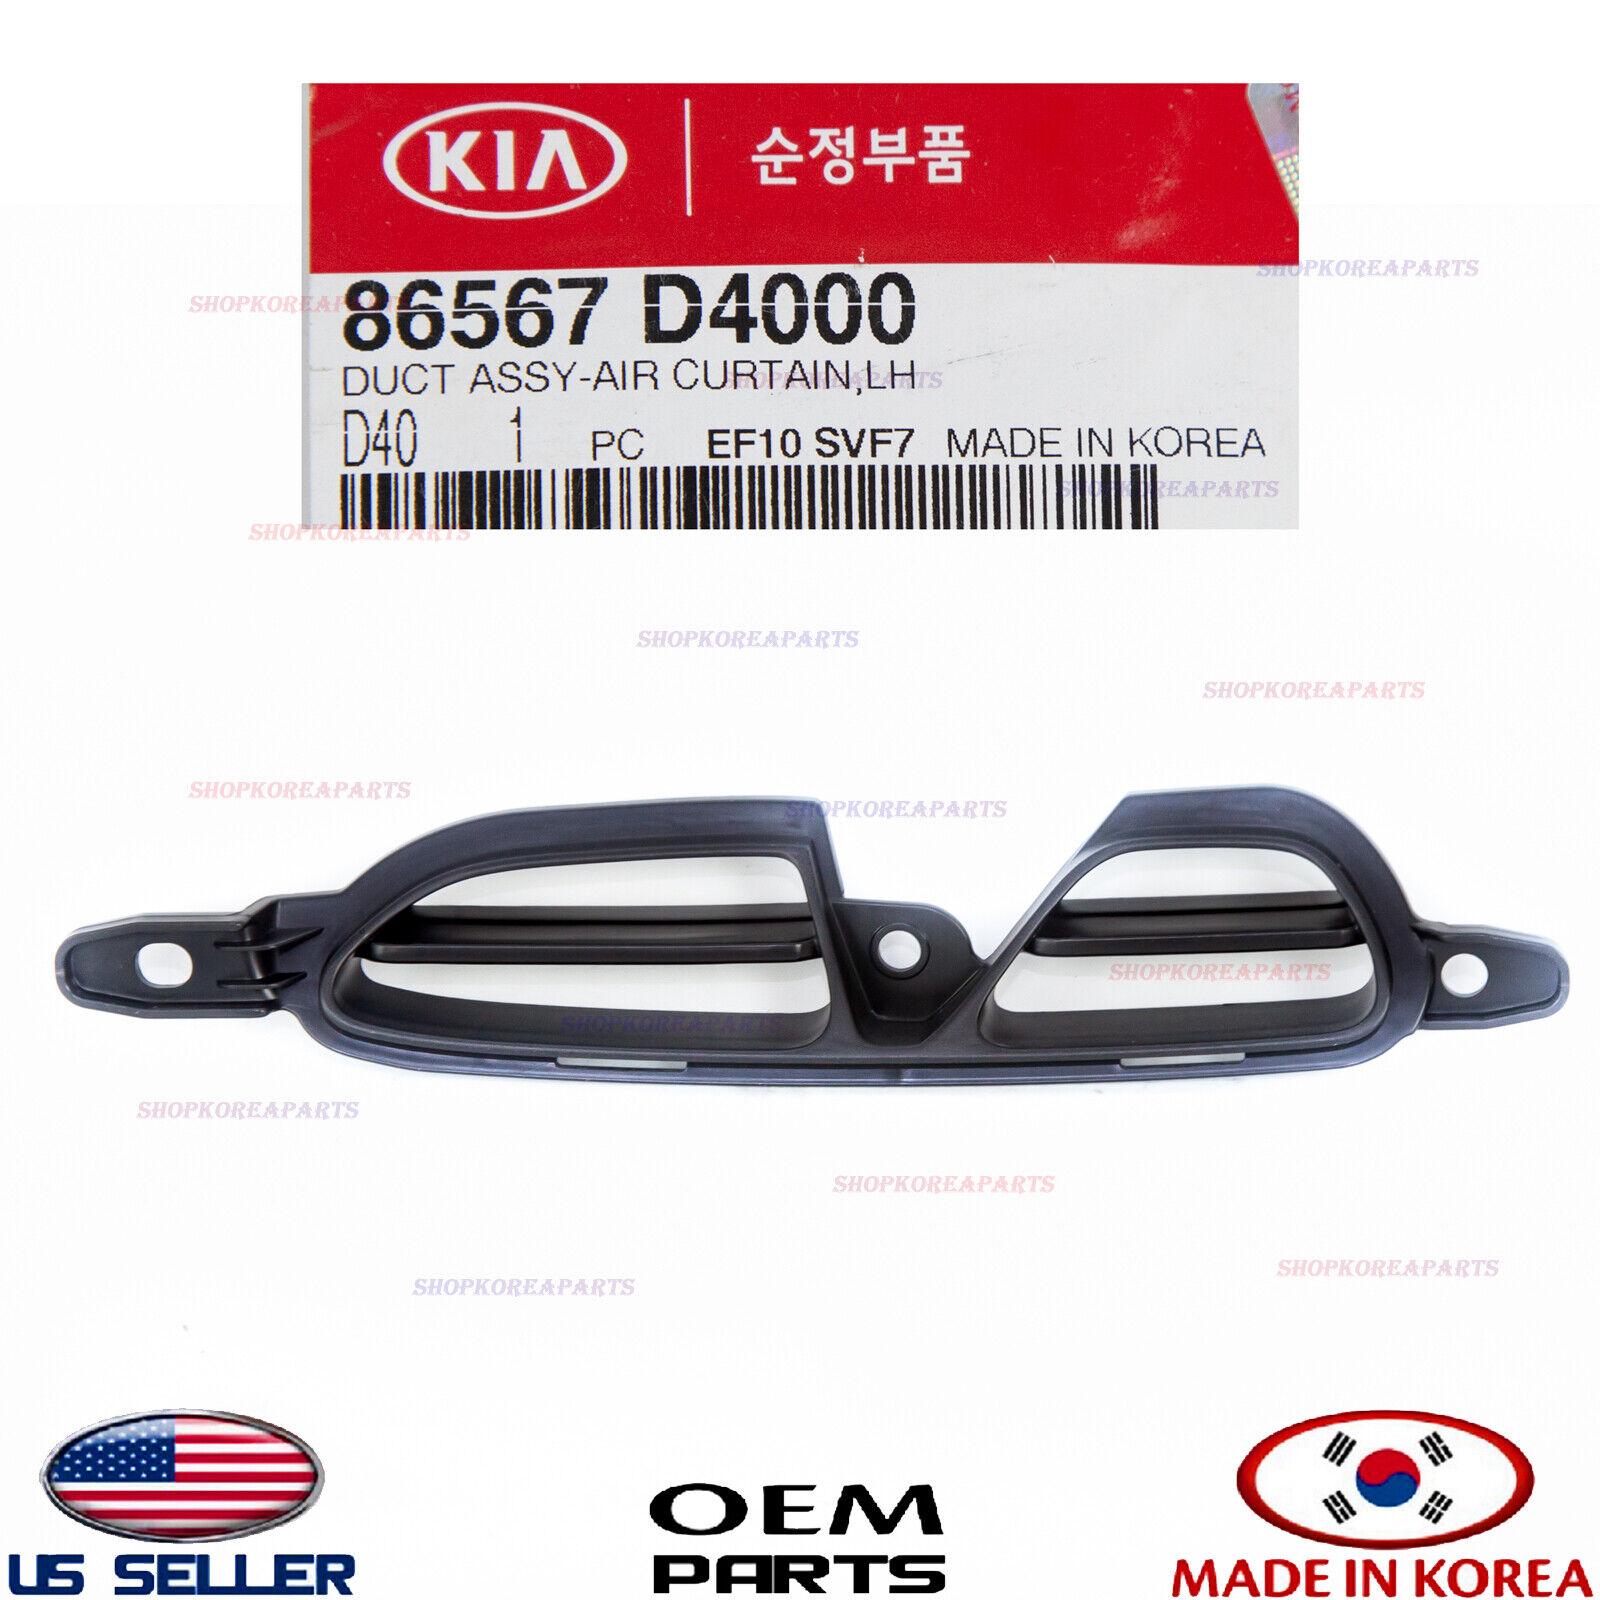 2019-2019 Kia Optima Driver Side Bumper Cover Air Duct; Made Of Pp Plastic Partslink KI1038133